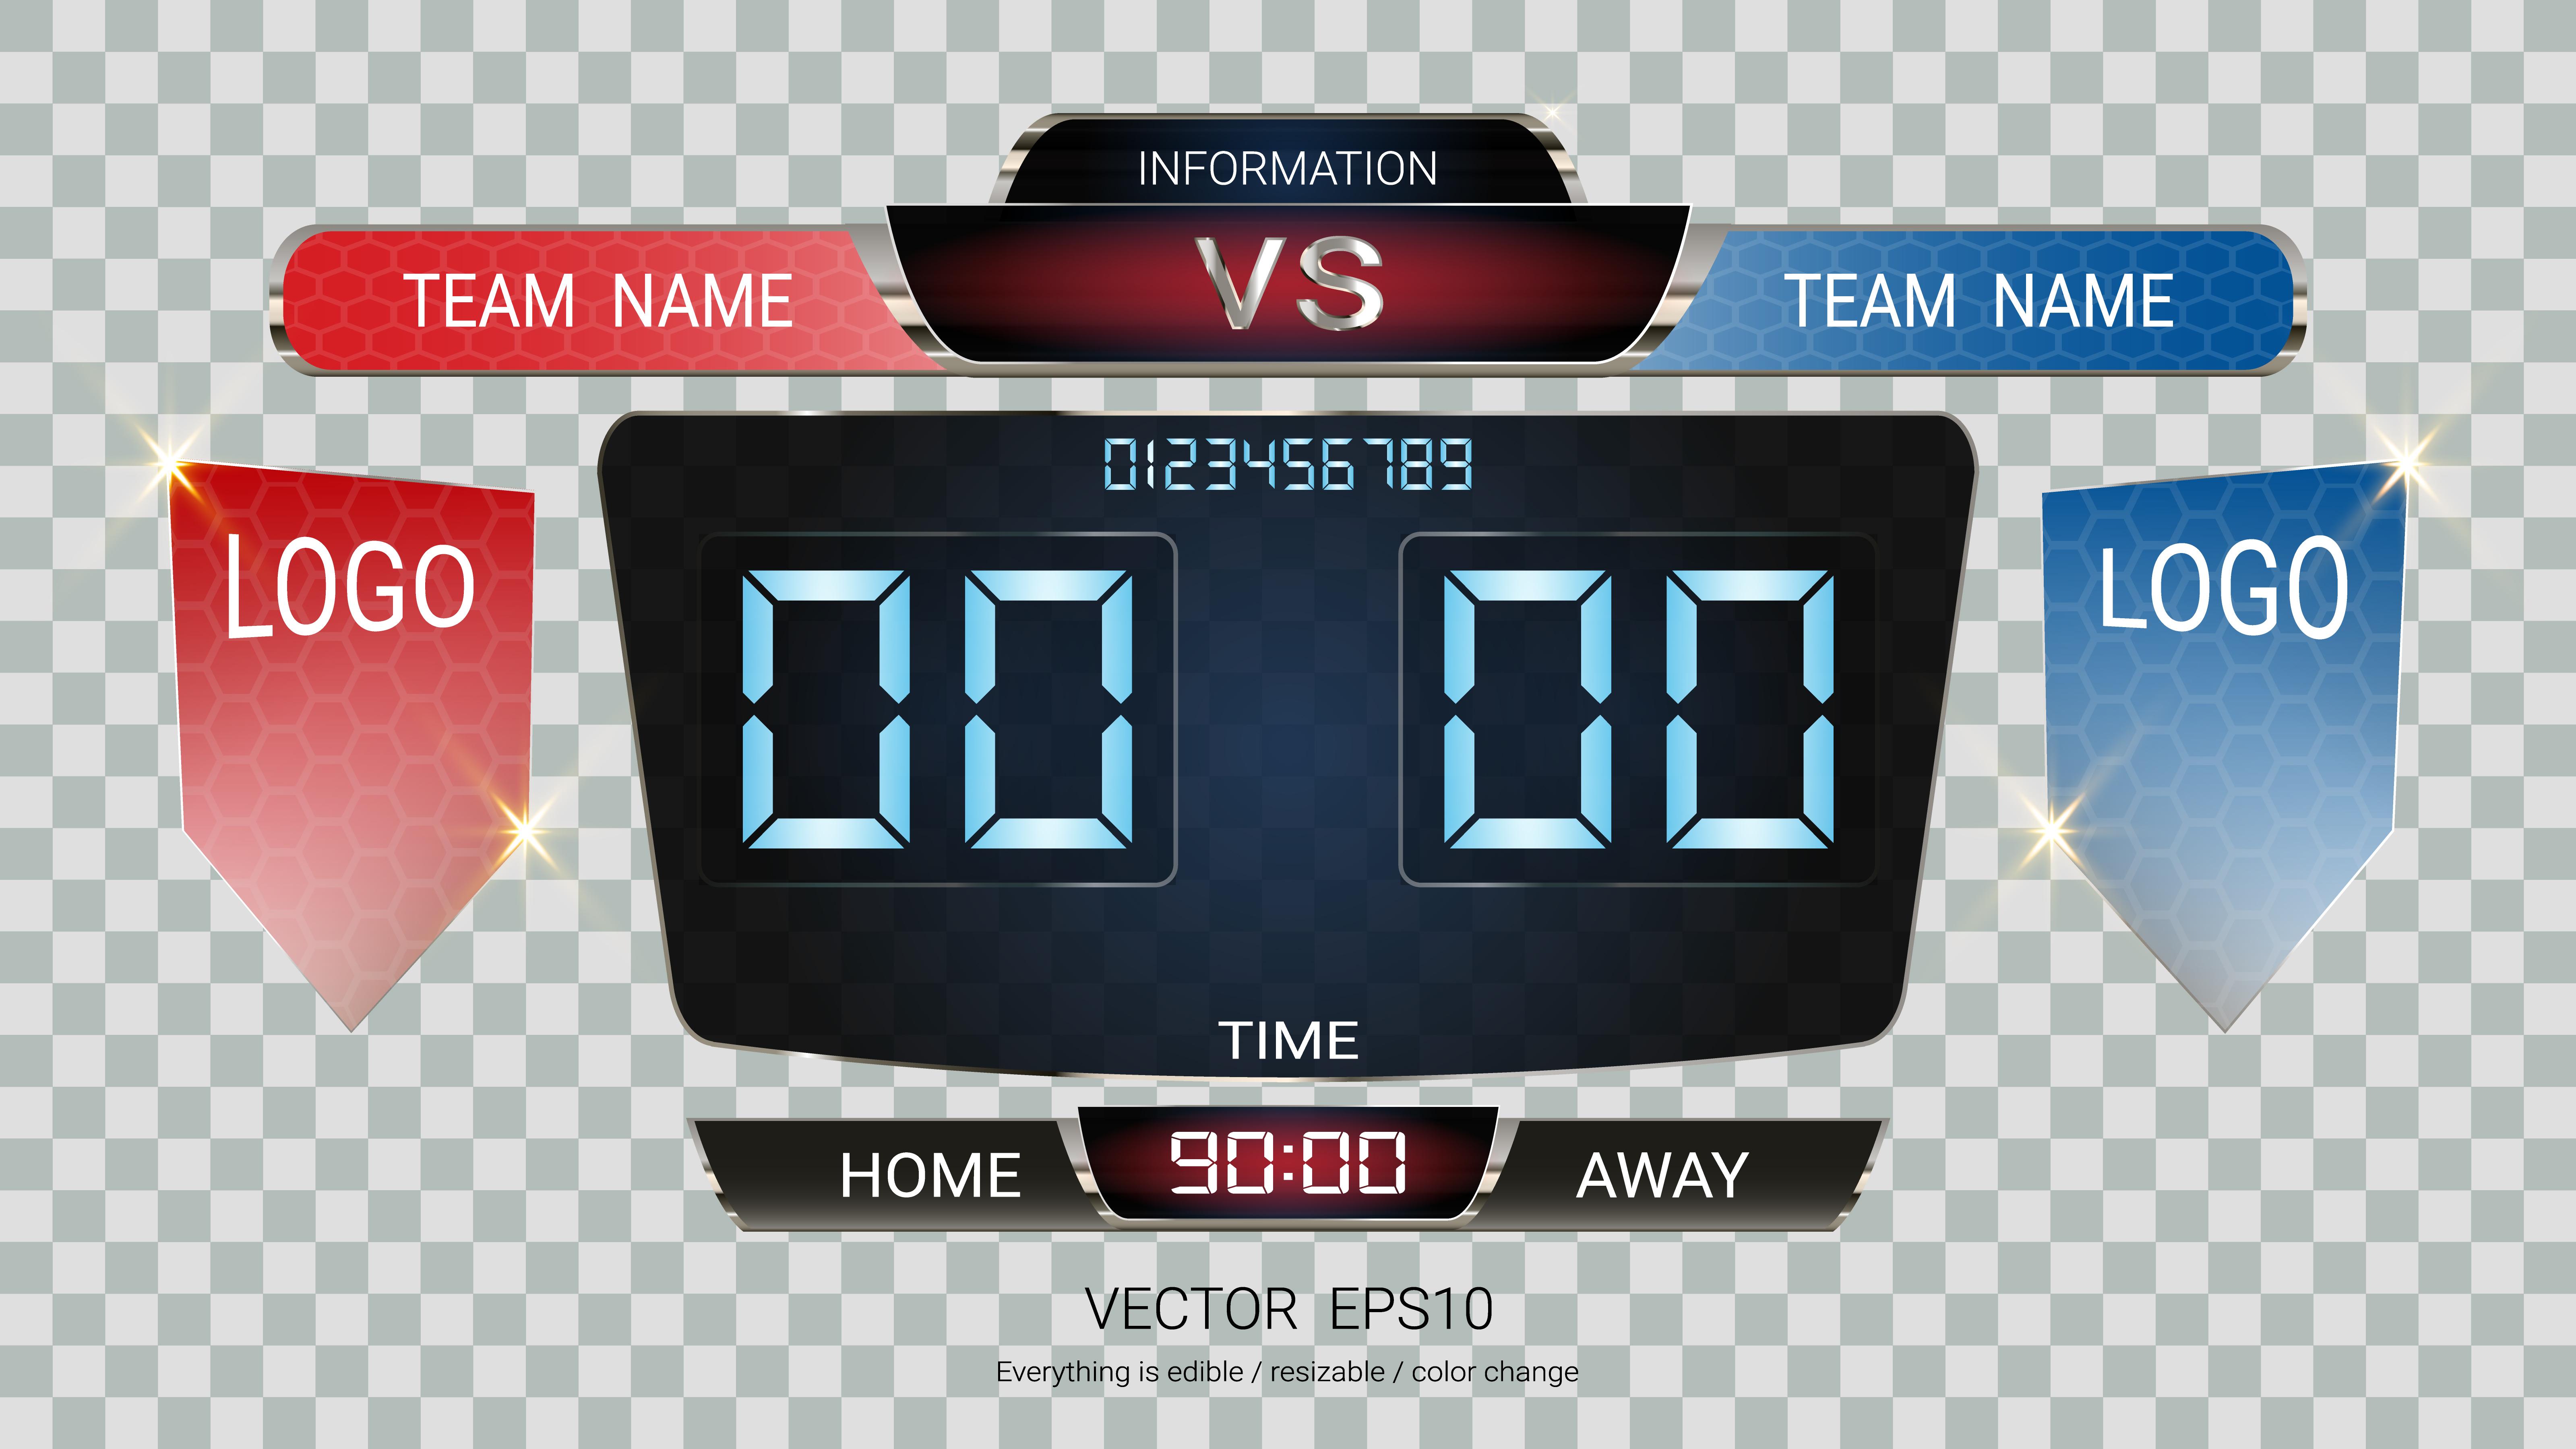 digital timing scoreboard  football match team a vs team b  strategy broadcast graphic template